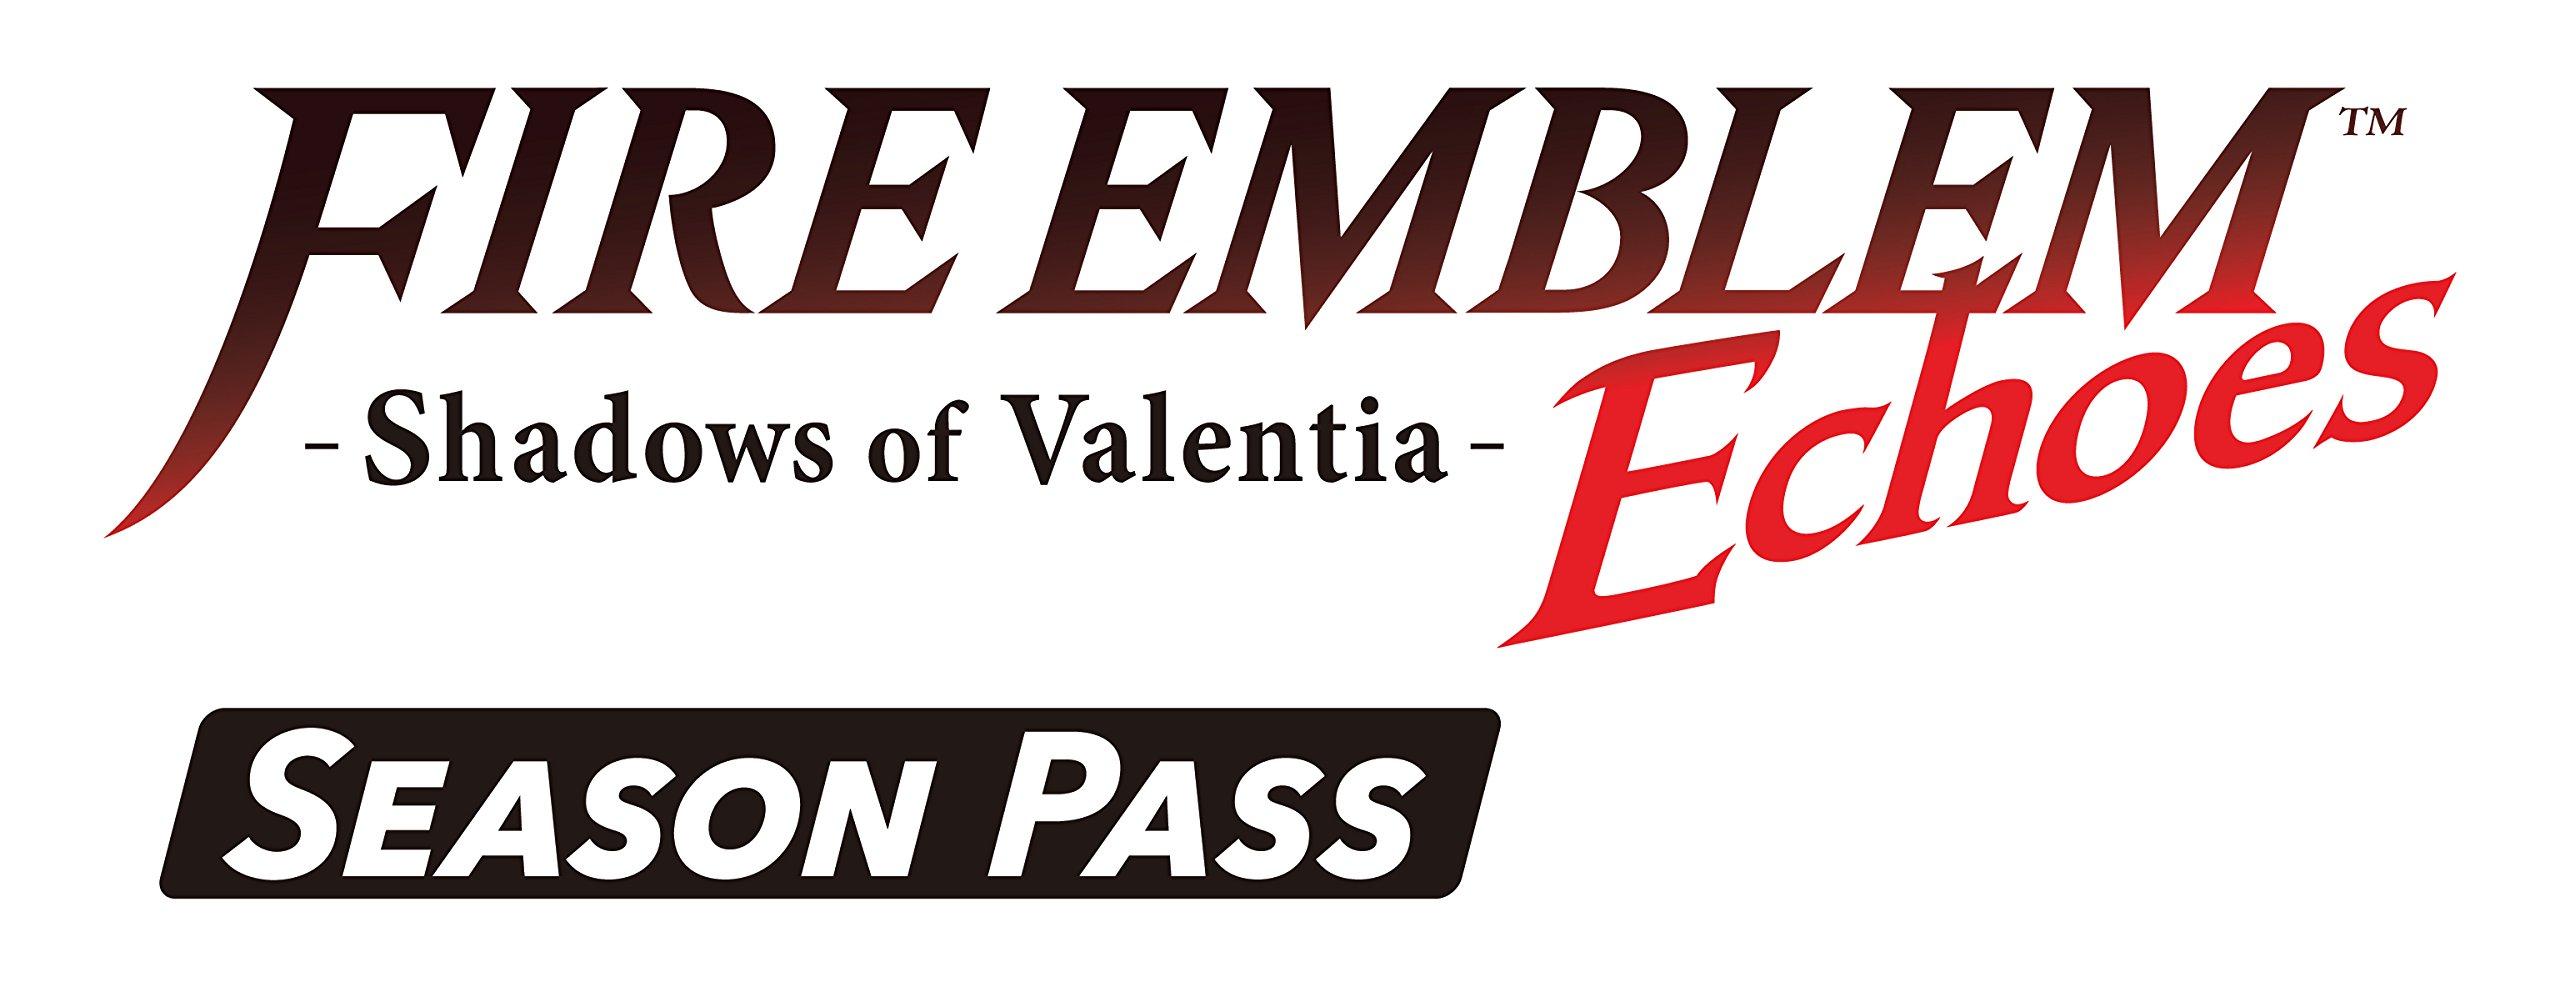 Fire Emblem Echoes: Shadows of Valentia Season Pass - Nintendo 3DS [Digital Code]